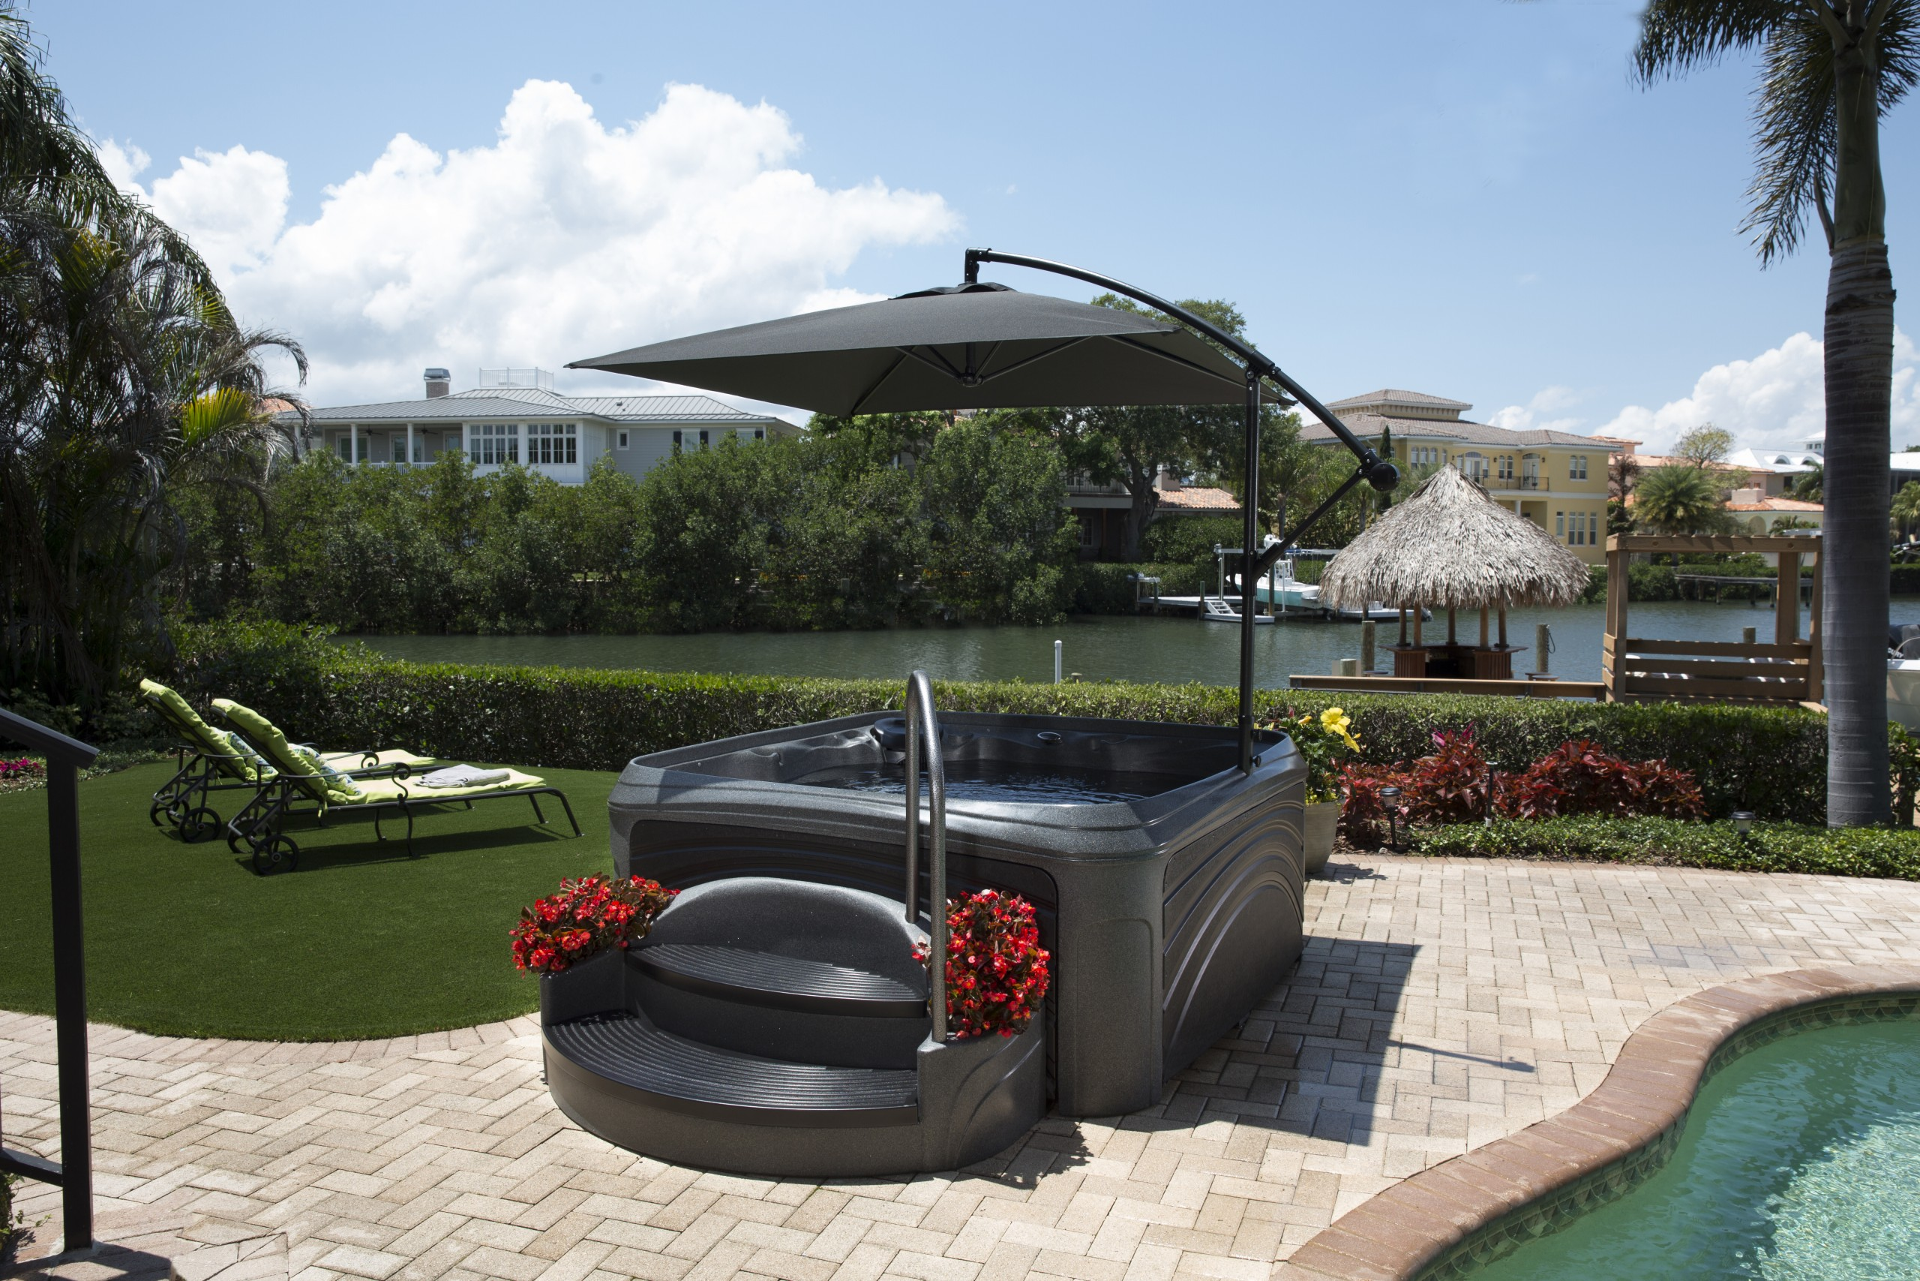 Dream Maker hot tub Cabana Suite